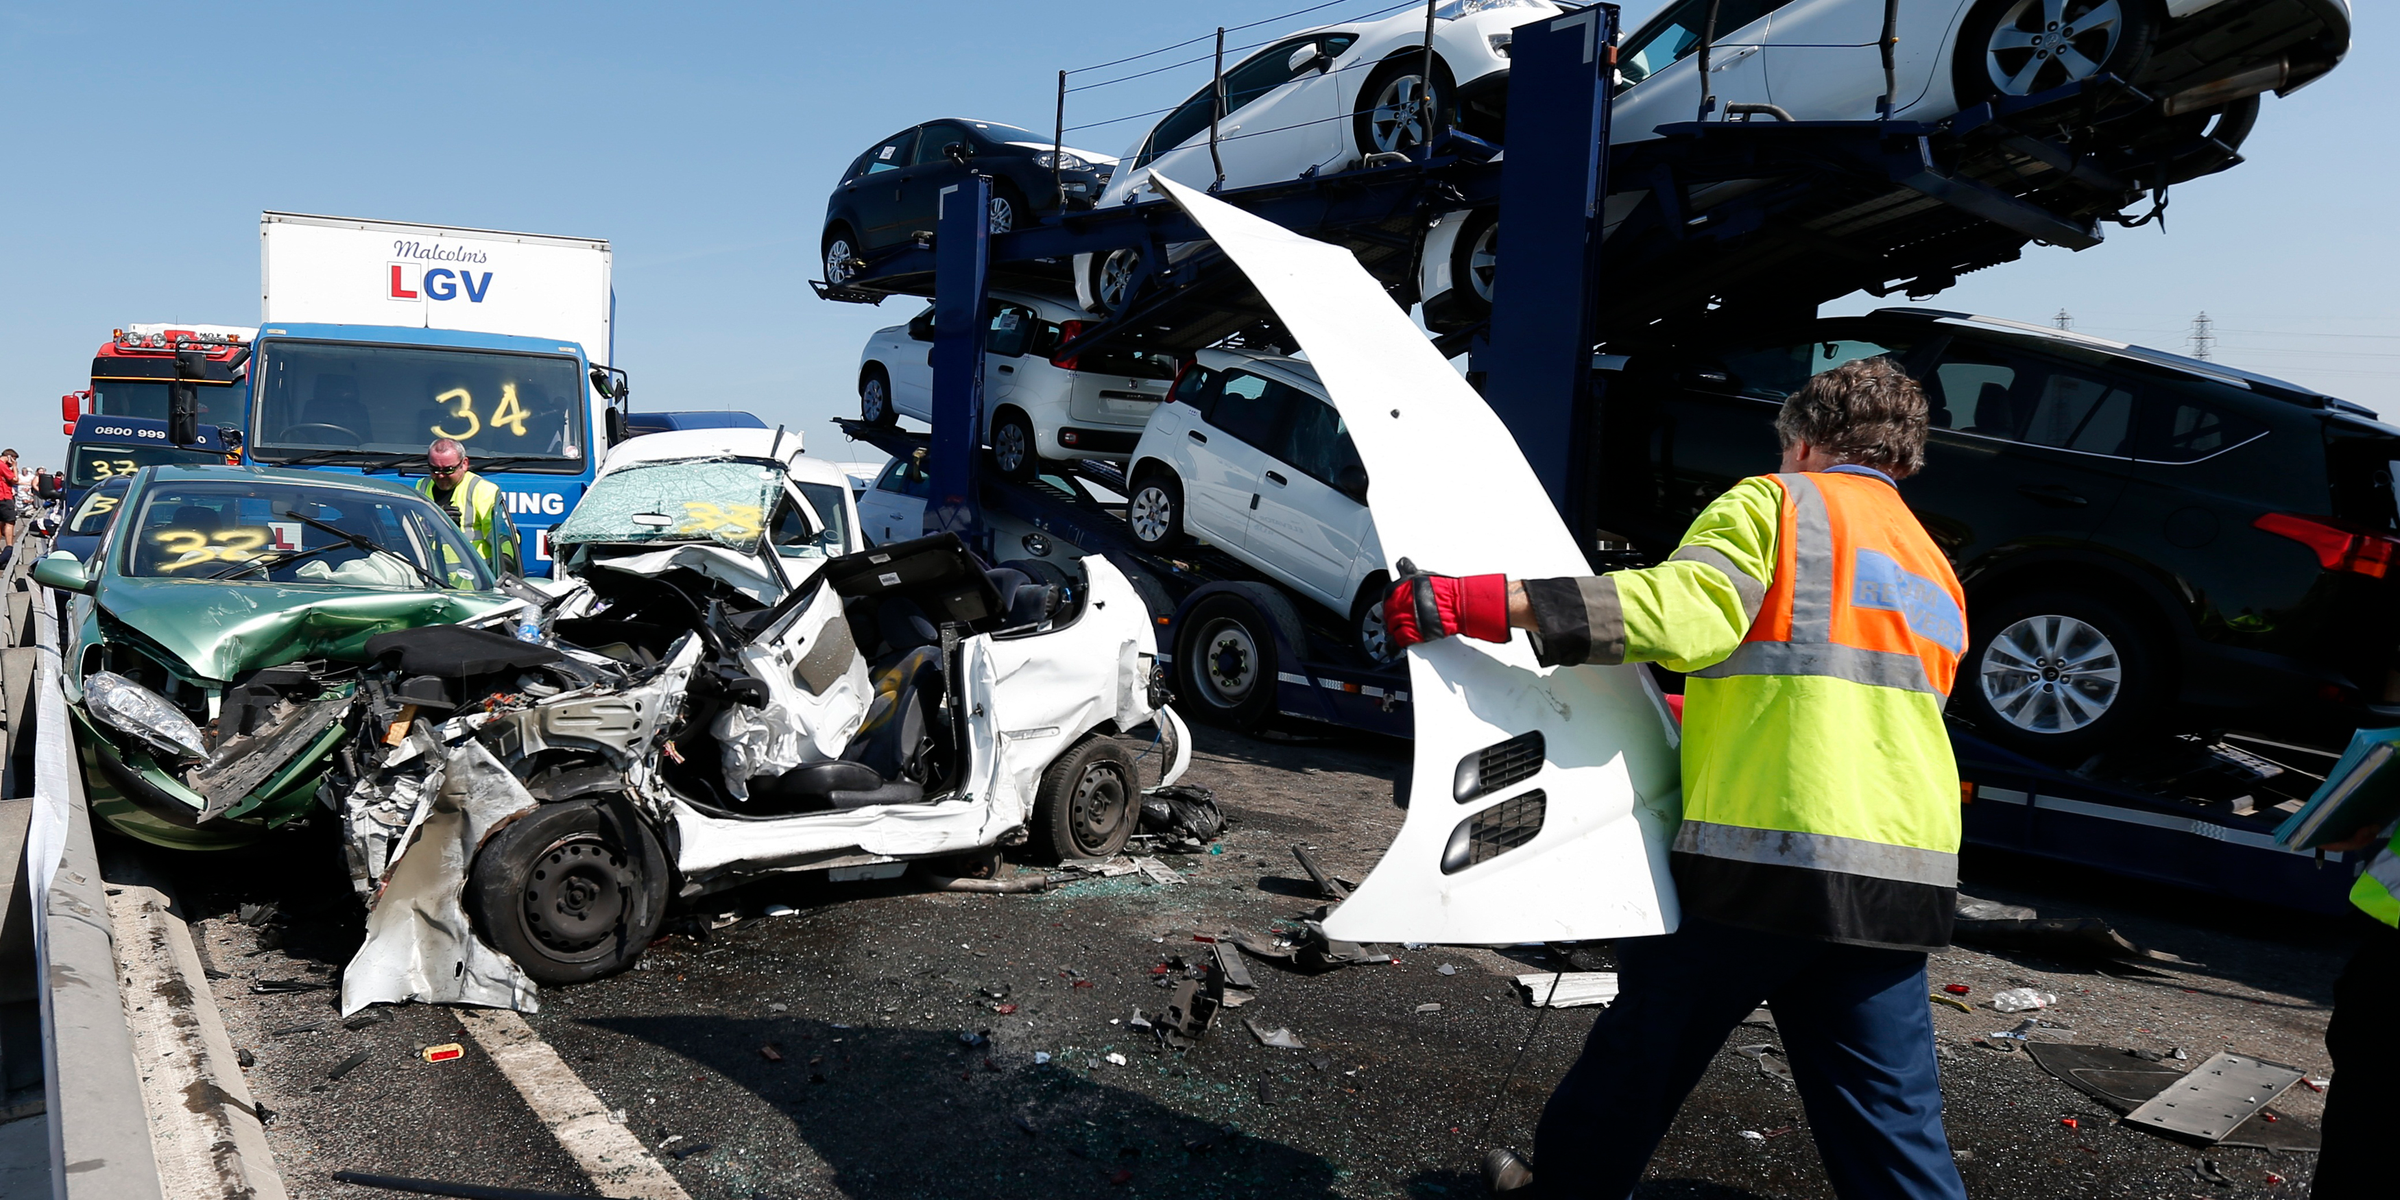 100-car pileup kent uk bridge traffic car crash accident